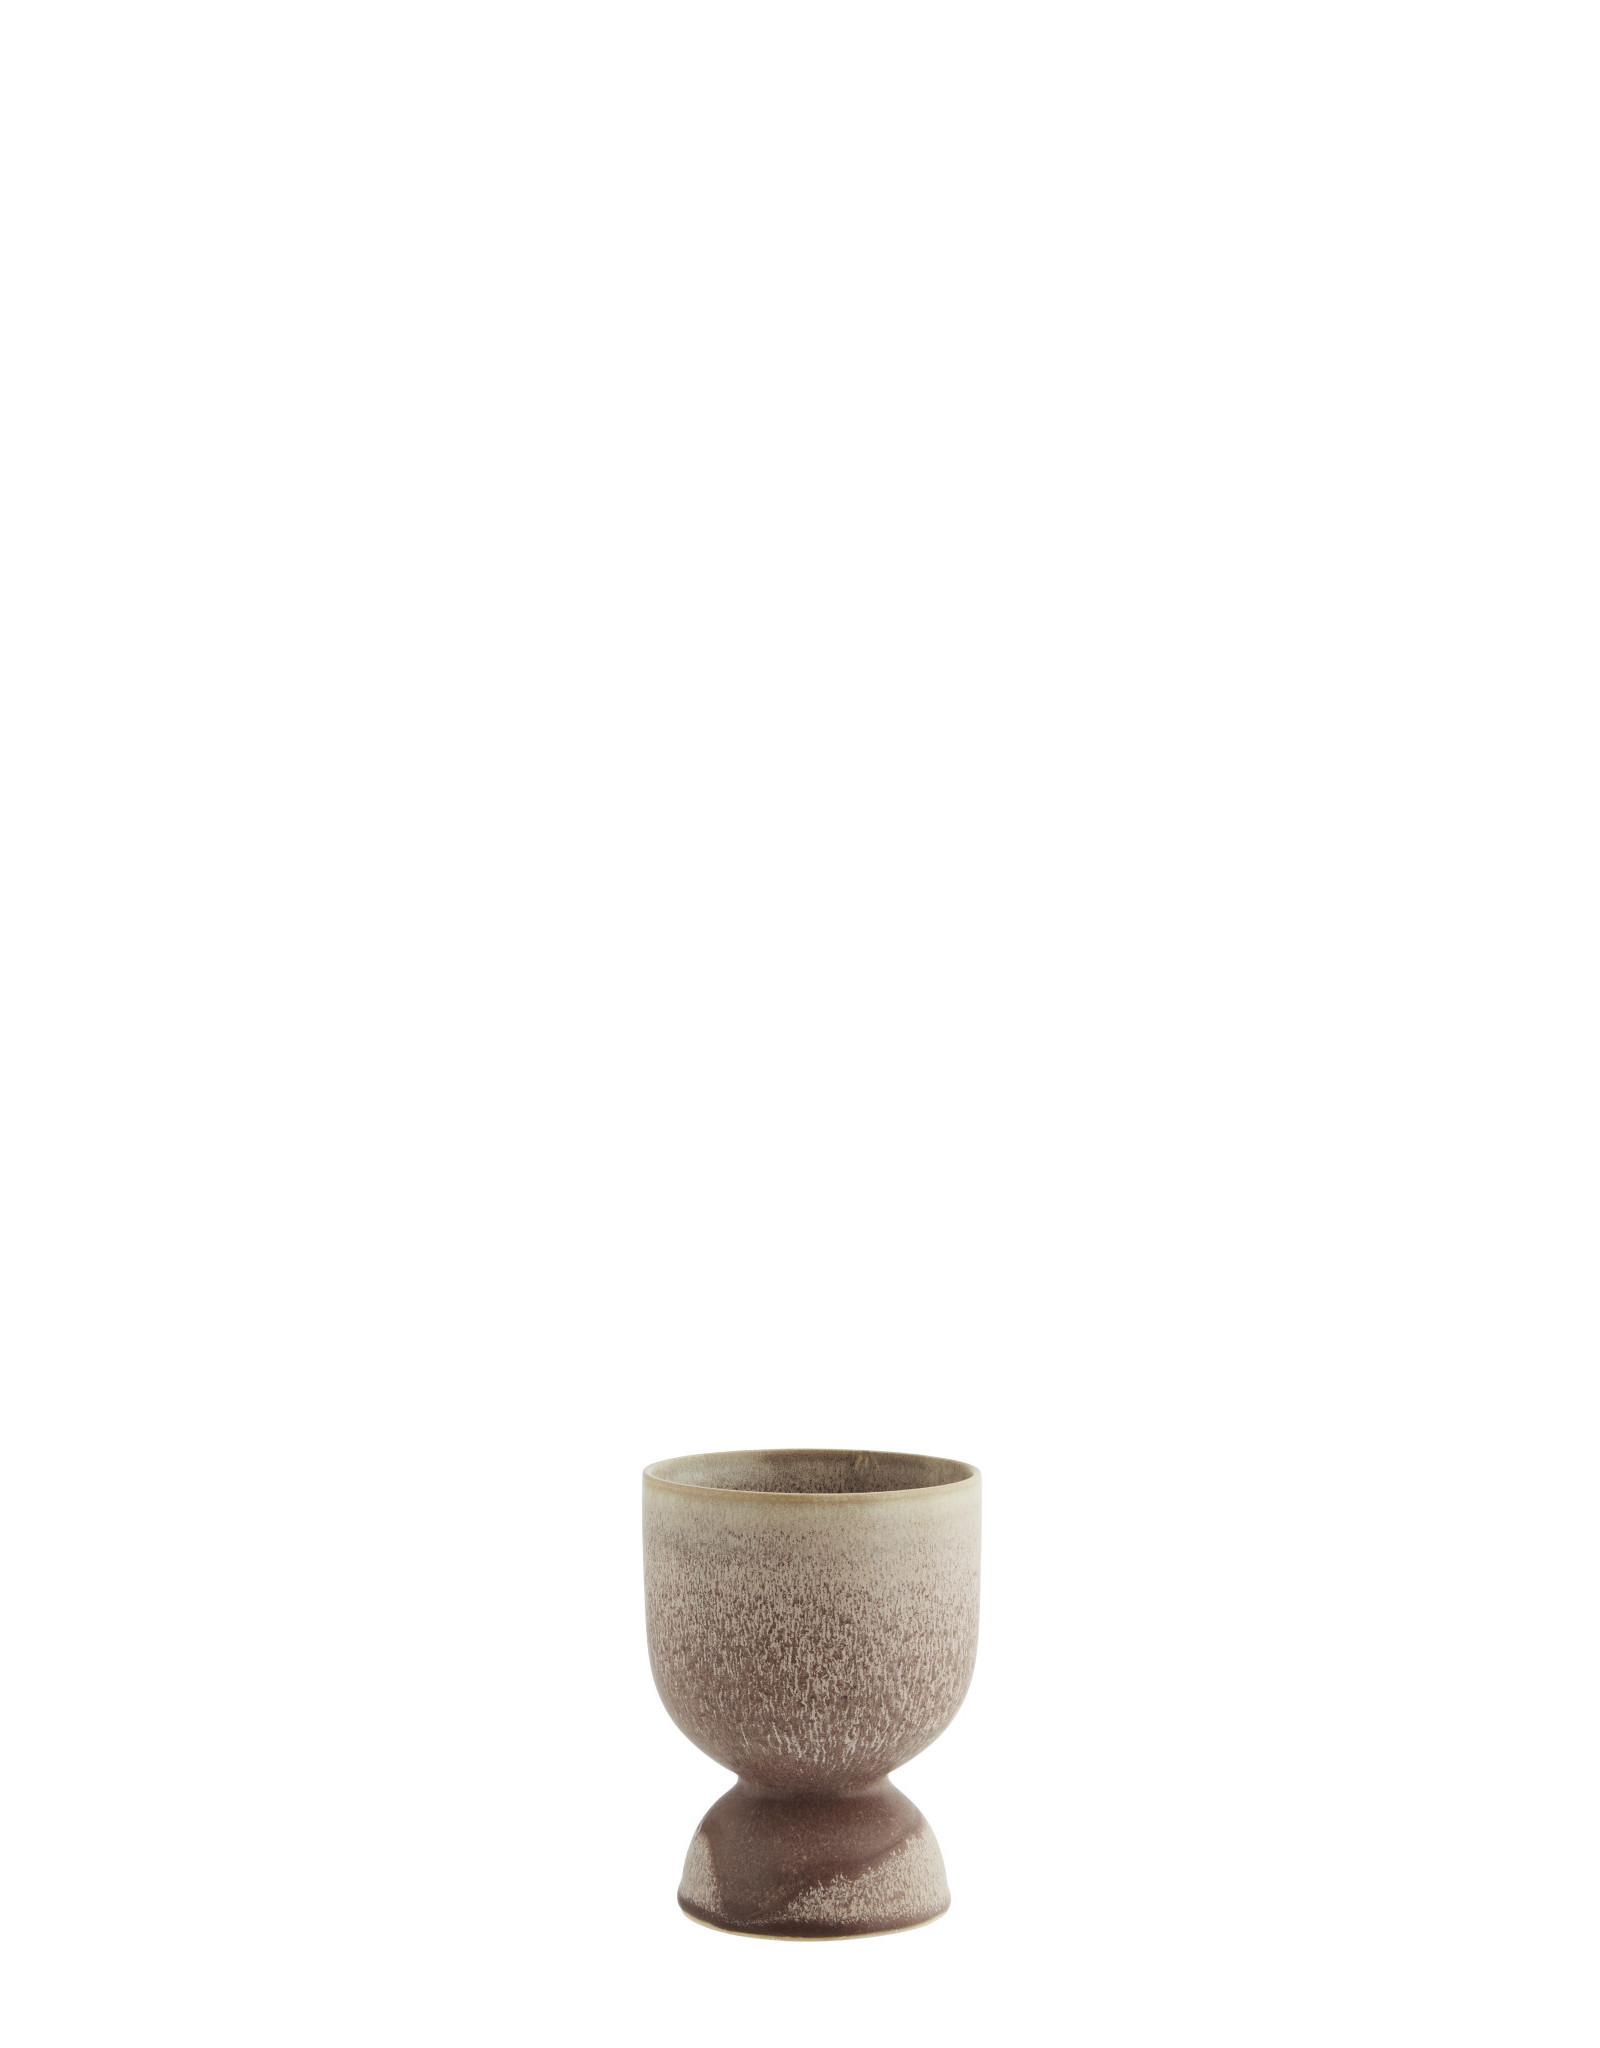 Madam Stolz Bloempot - Poeder, Bruin - Ø 10,5 x H 14,5 cm